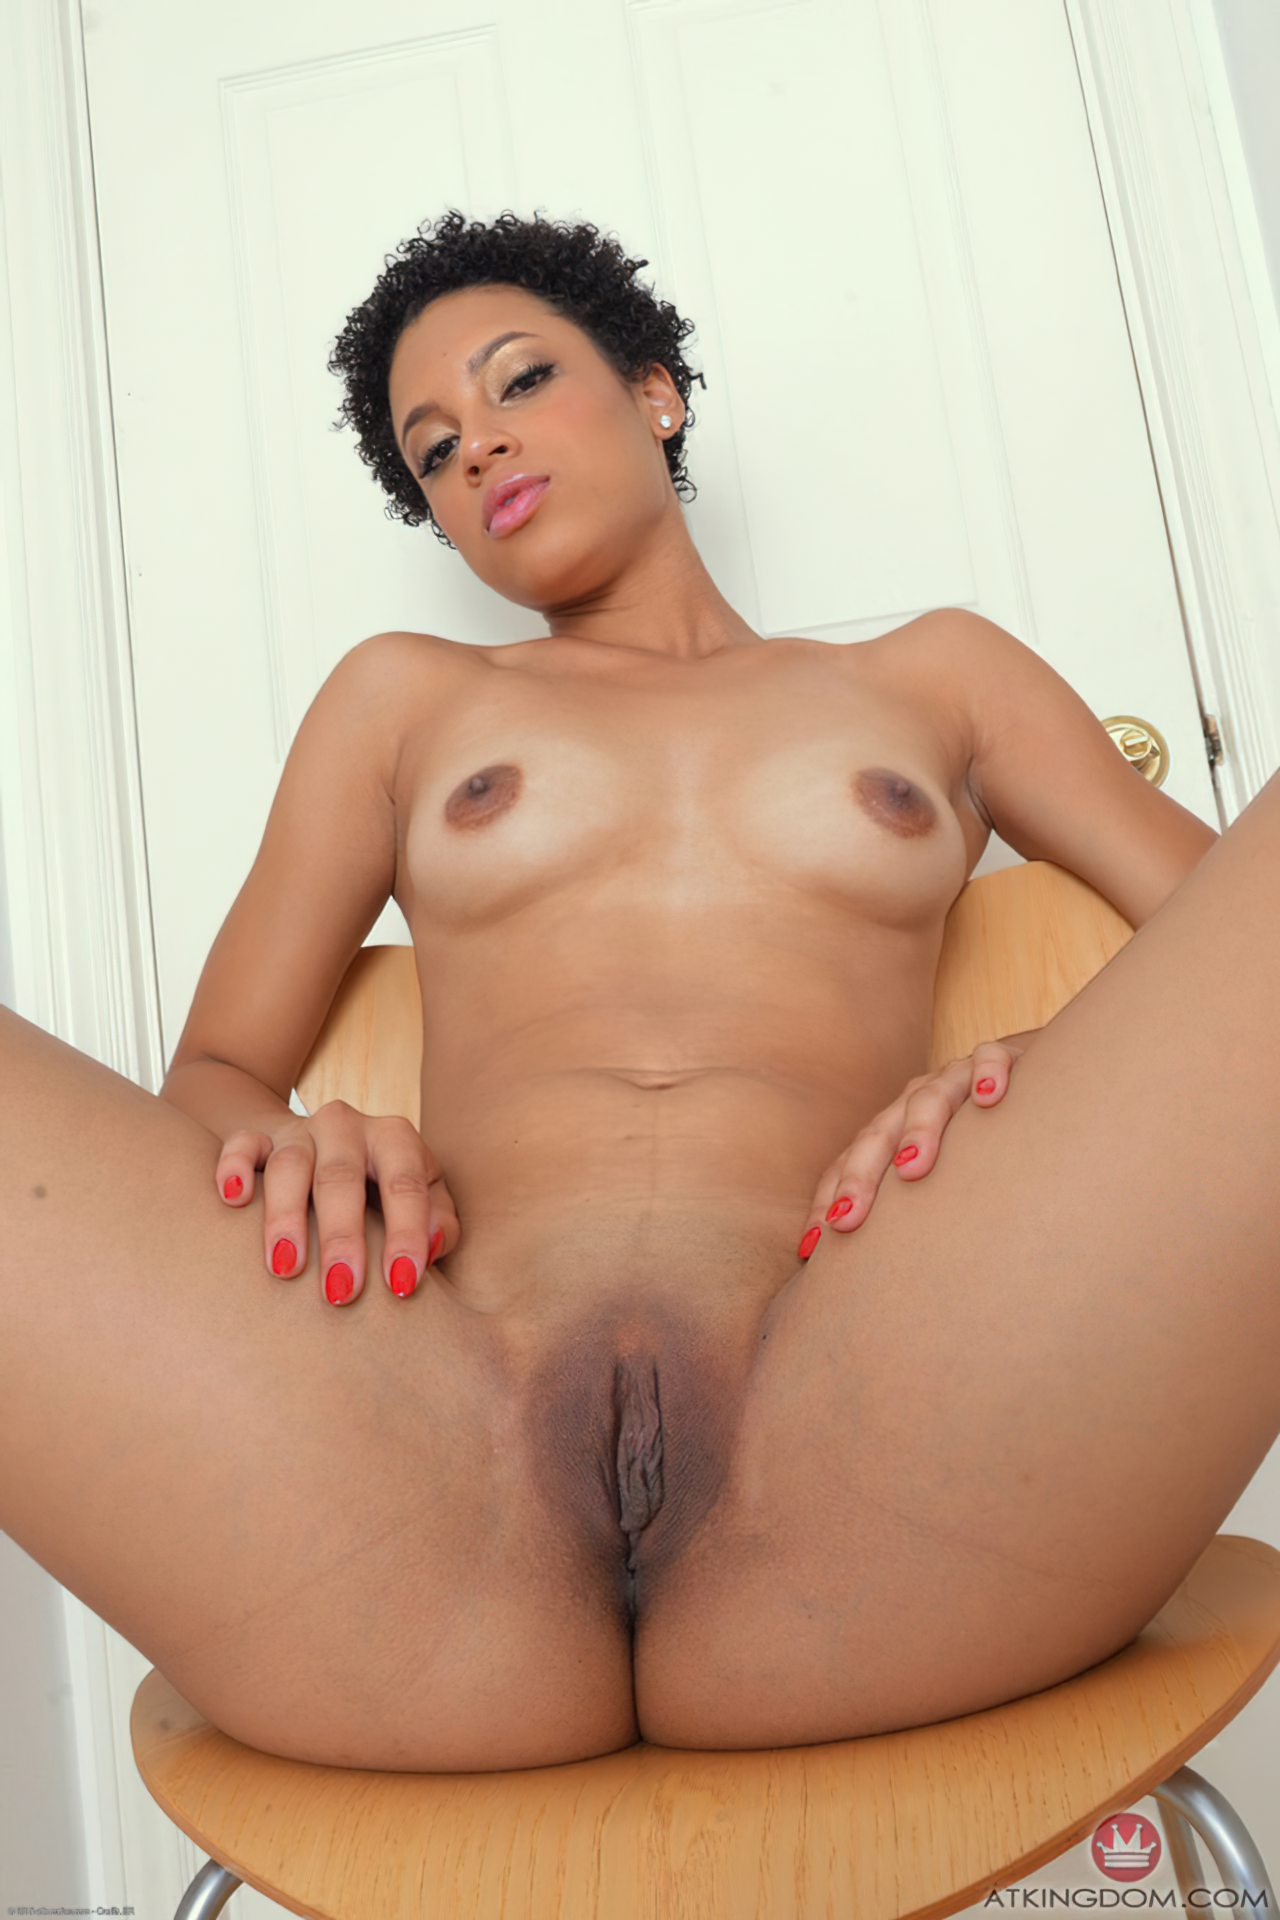 Mulher Negra Buceta Rosa (3)